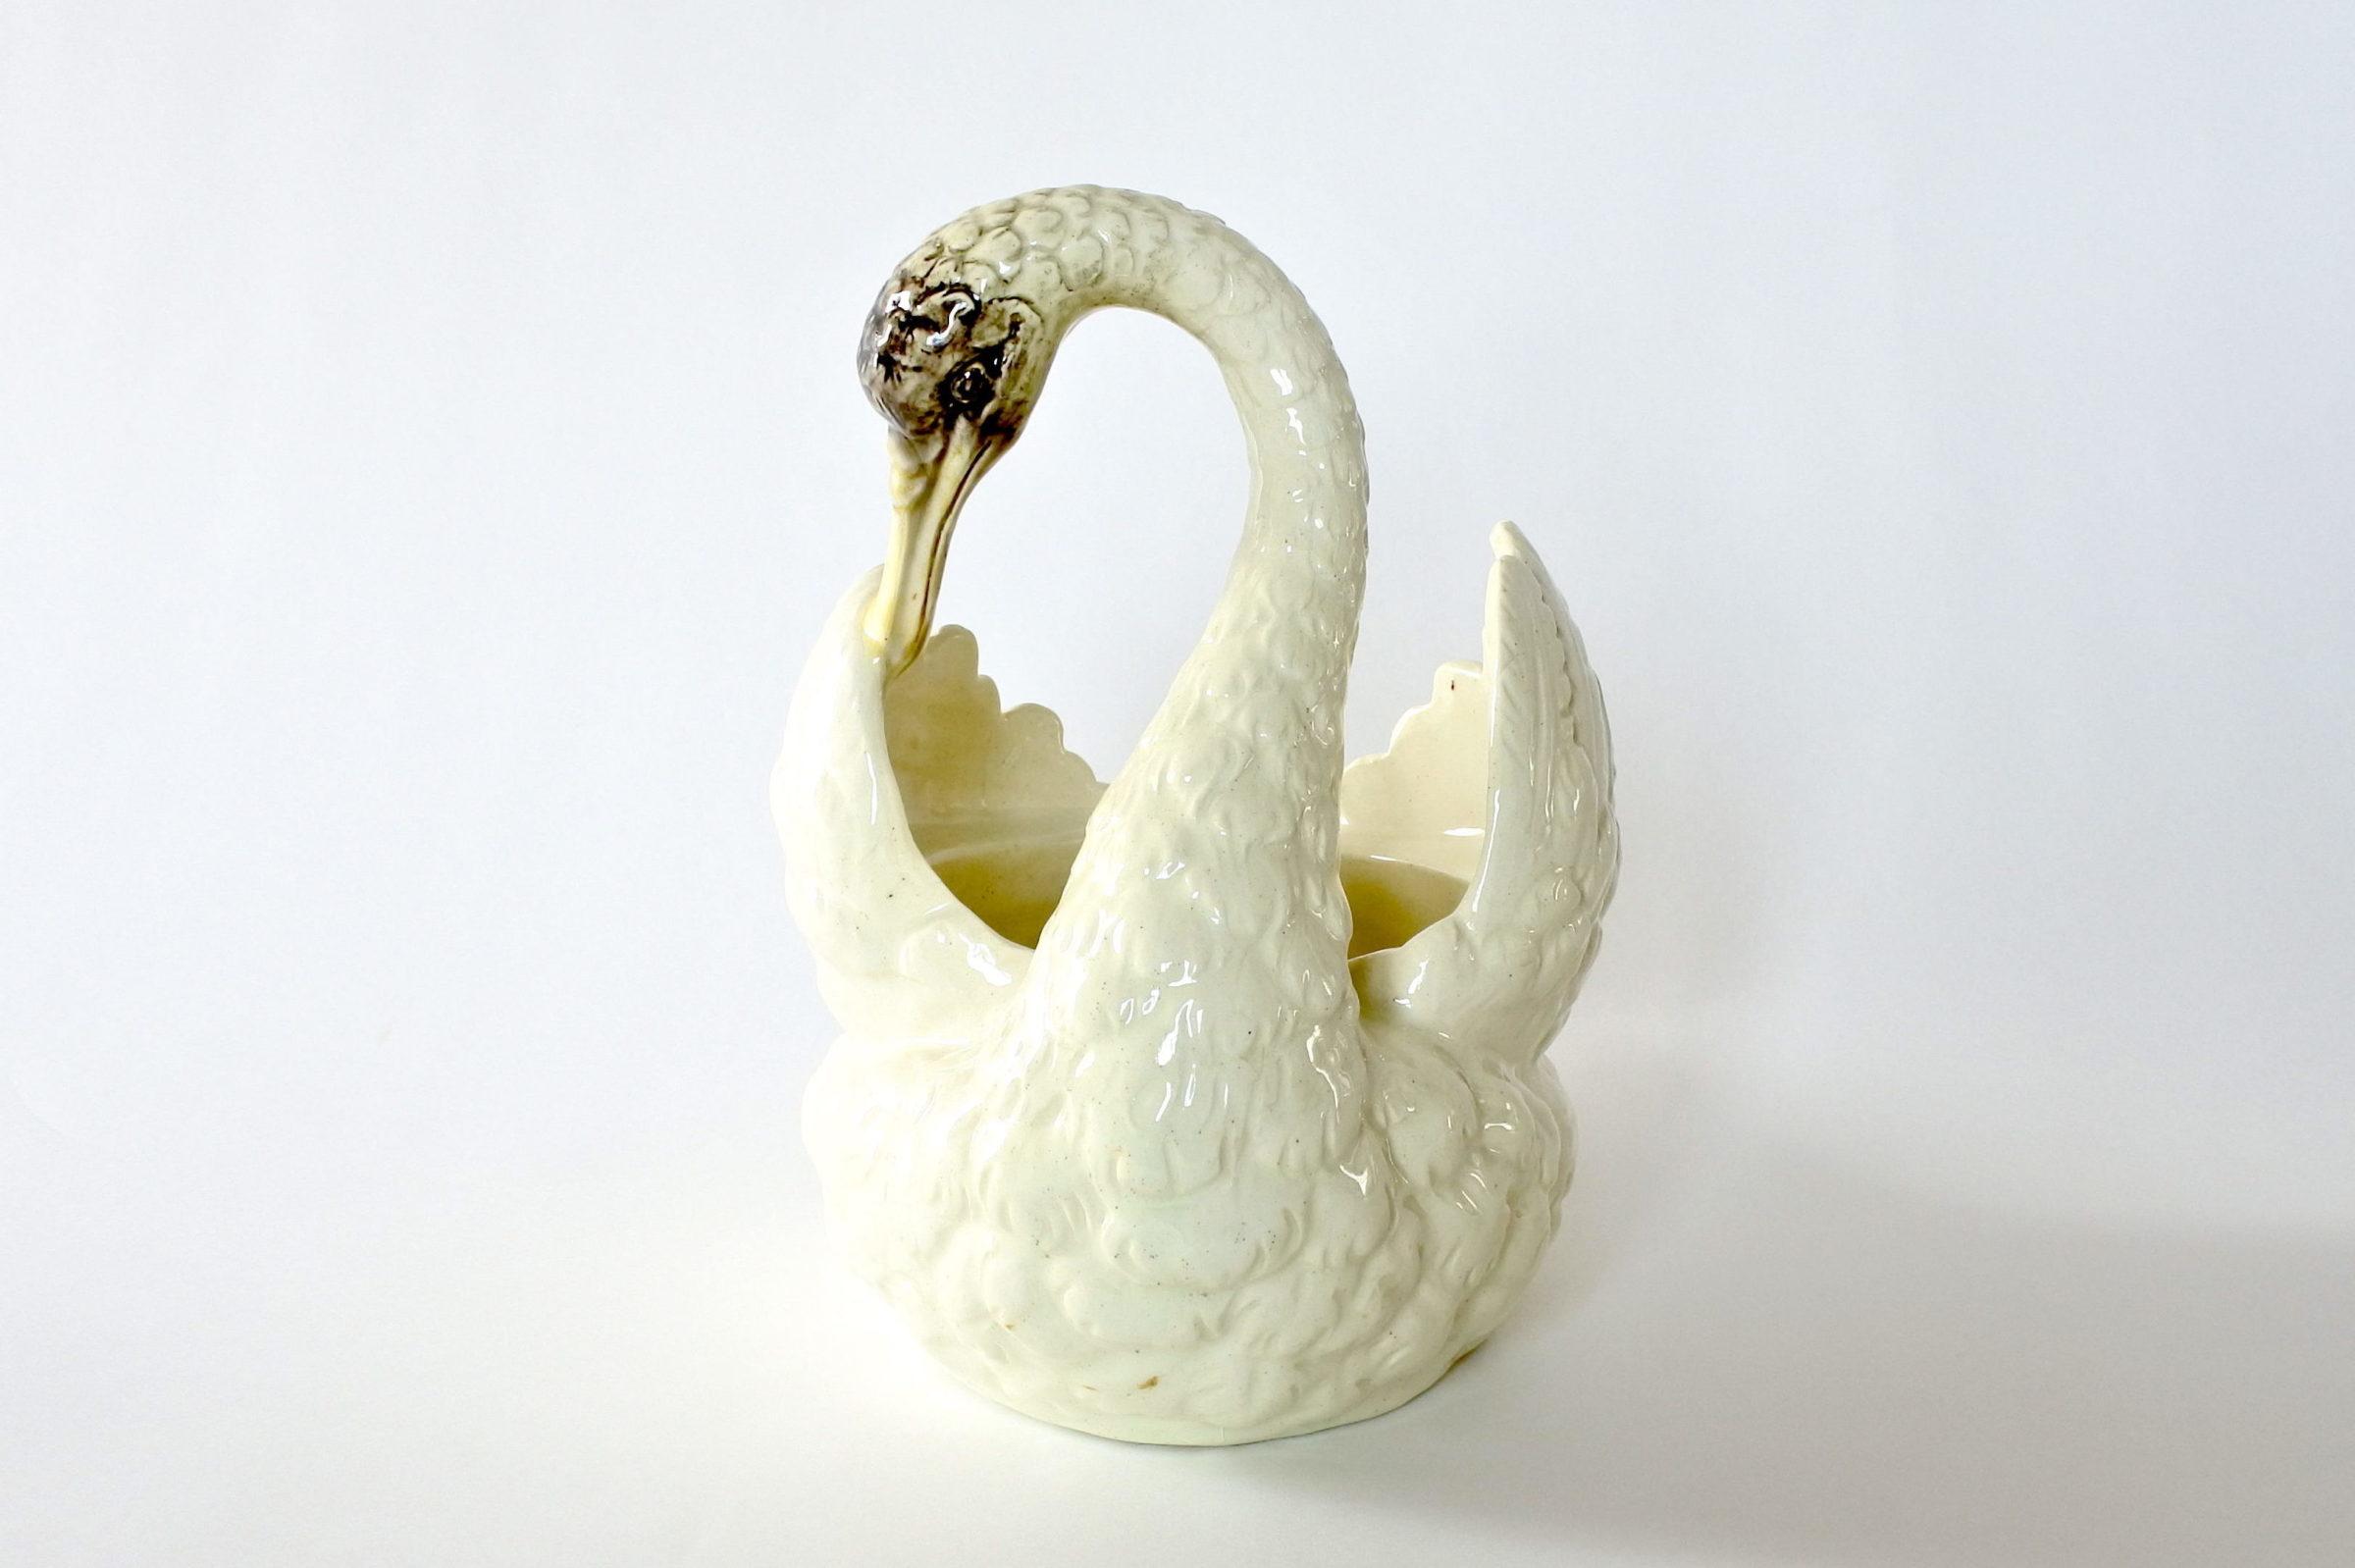 Cigno in ceramica barbotine con funzione di jardinière - Jérôme Massier Fils - 6